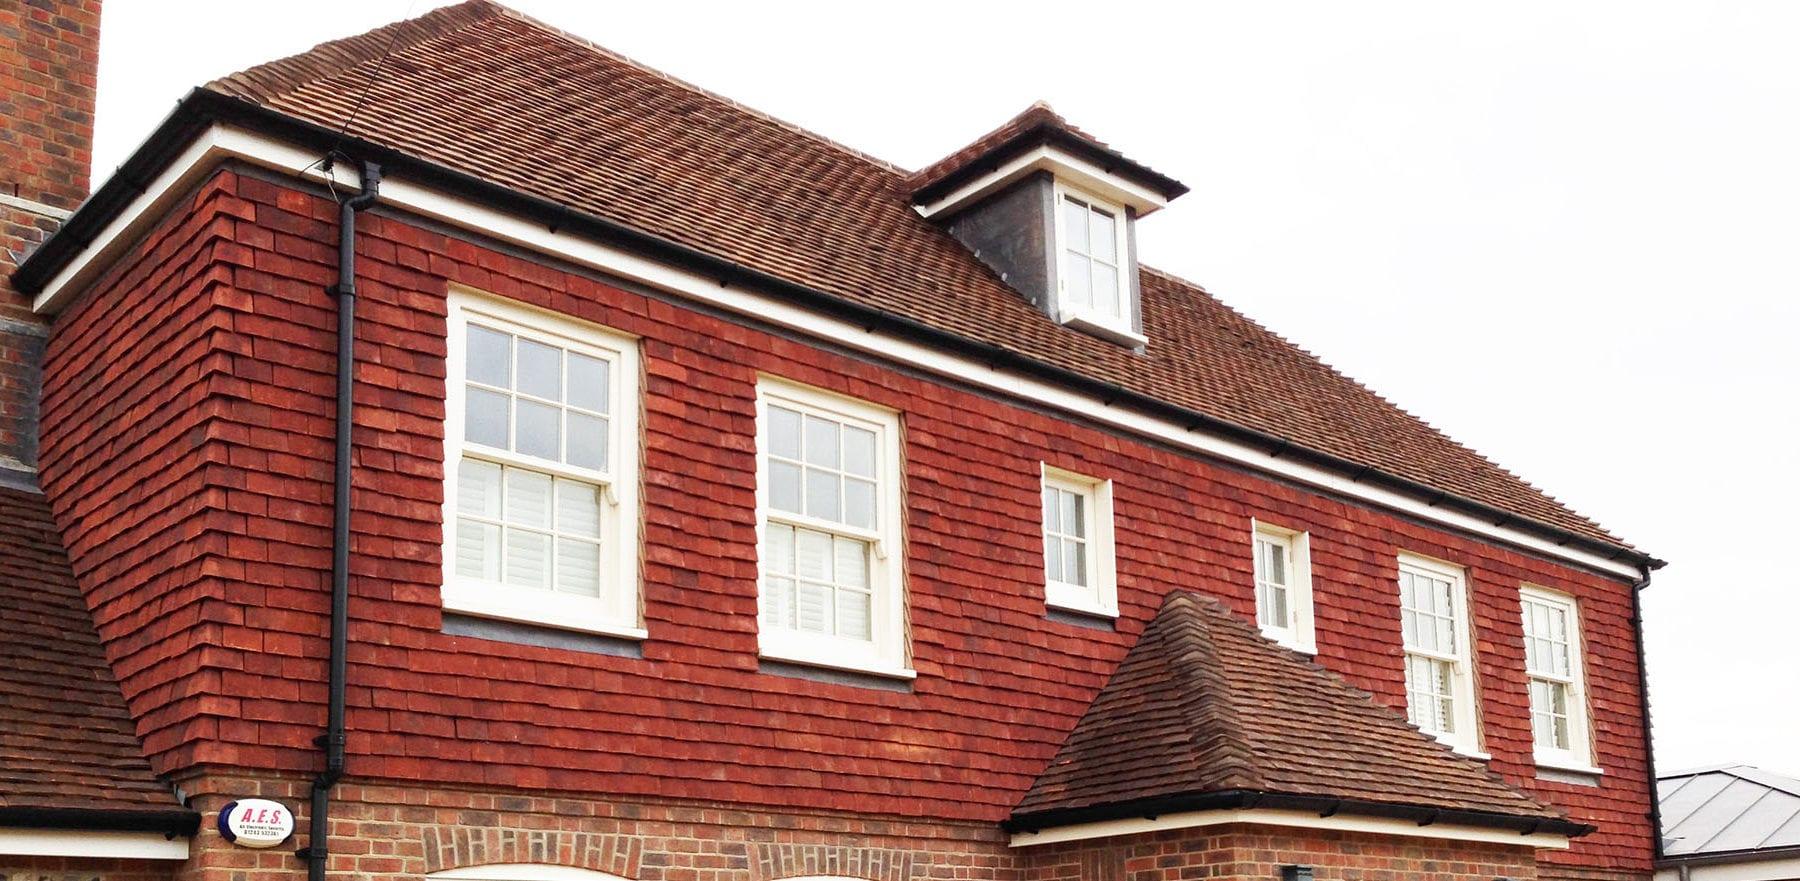 Lifestiles - Handmade Restoration Clay Roof Tiles - Chidham, England 4